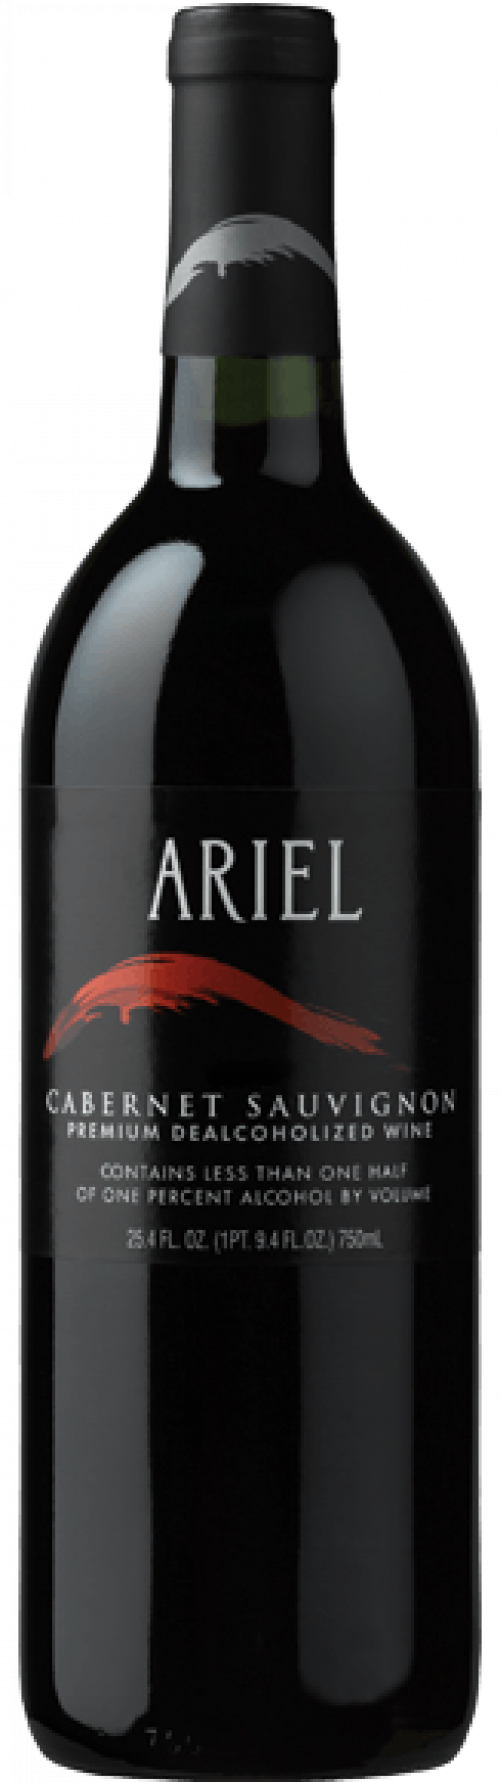 Ariel Cabernet Sauvignon 750ml NV